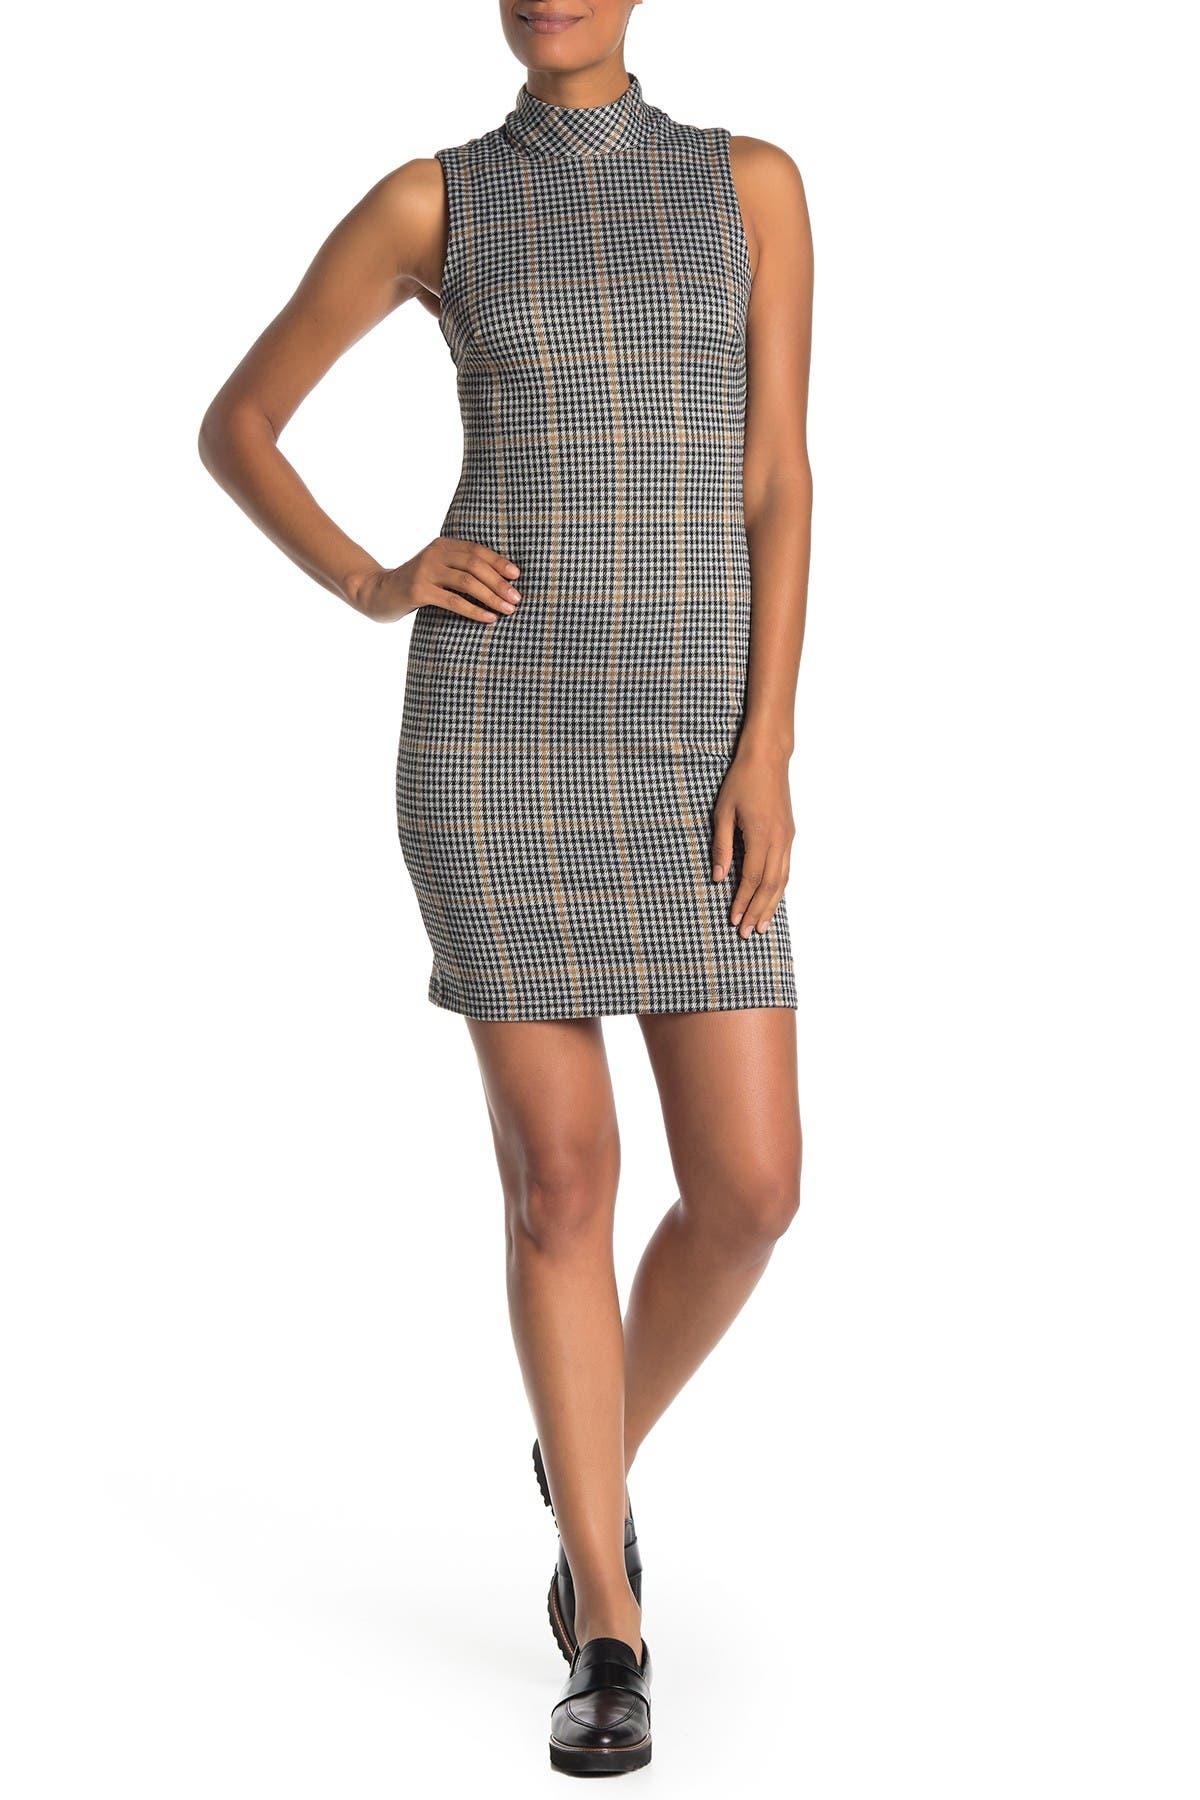 Image of RD Style Menswear Sleeveless Mock Neck Dress